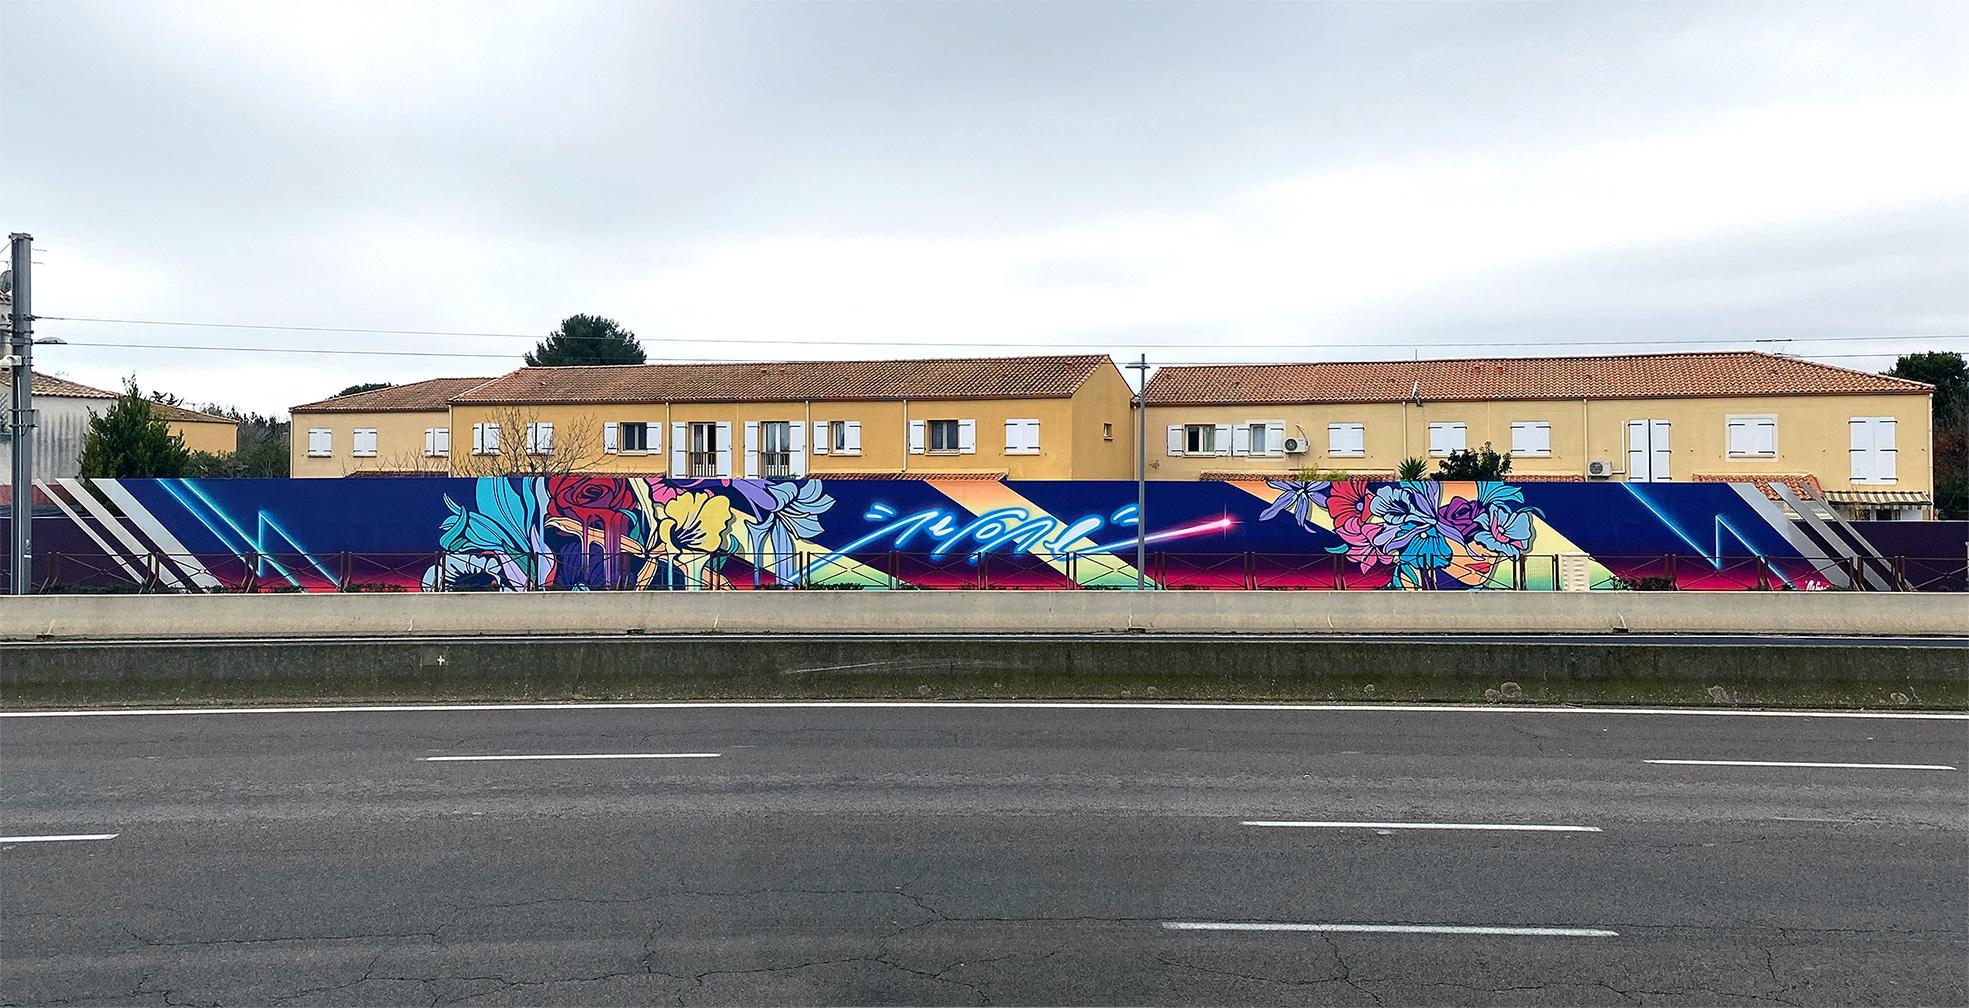 nerone-le-mur-de-perols-street-art-9